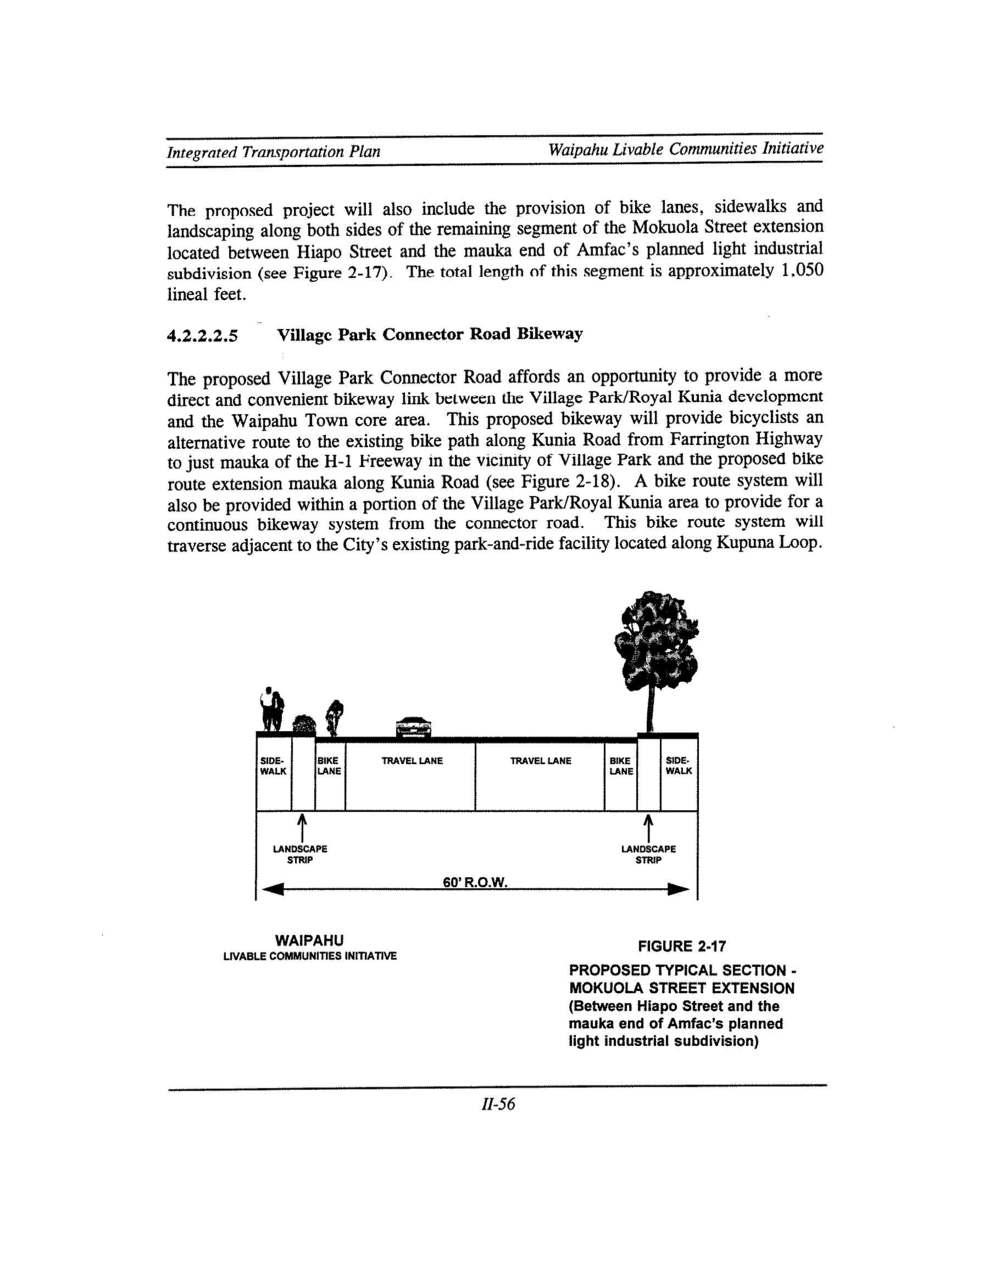 160531_WaipahuLivableCommunities(1998)_Page_071.jpg